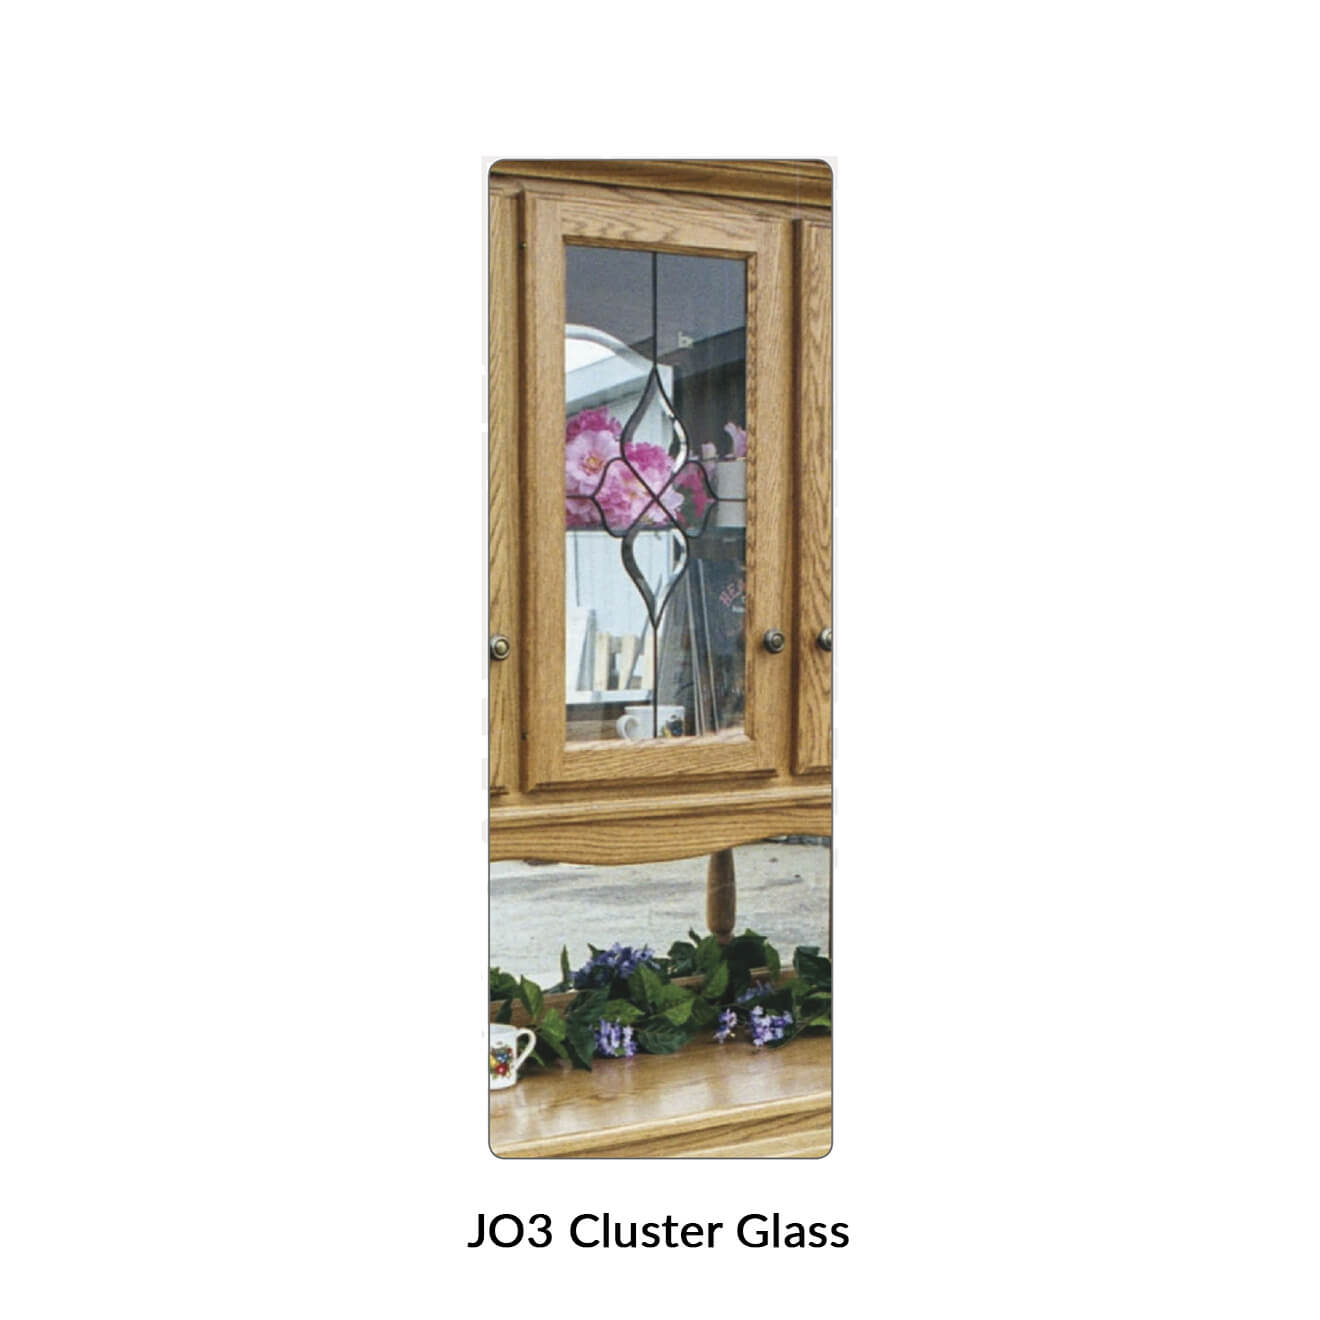 5-jo3-cluster-glass.jpg